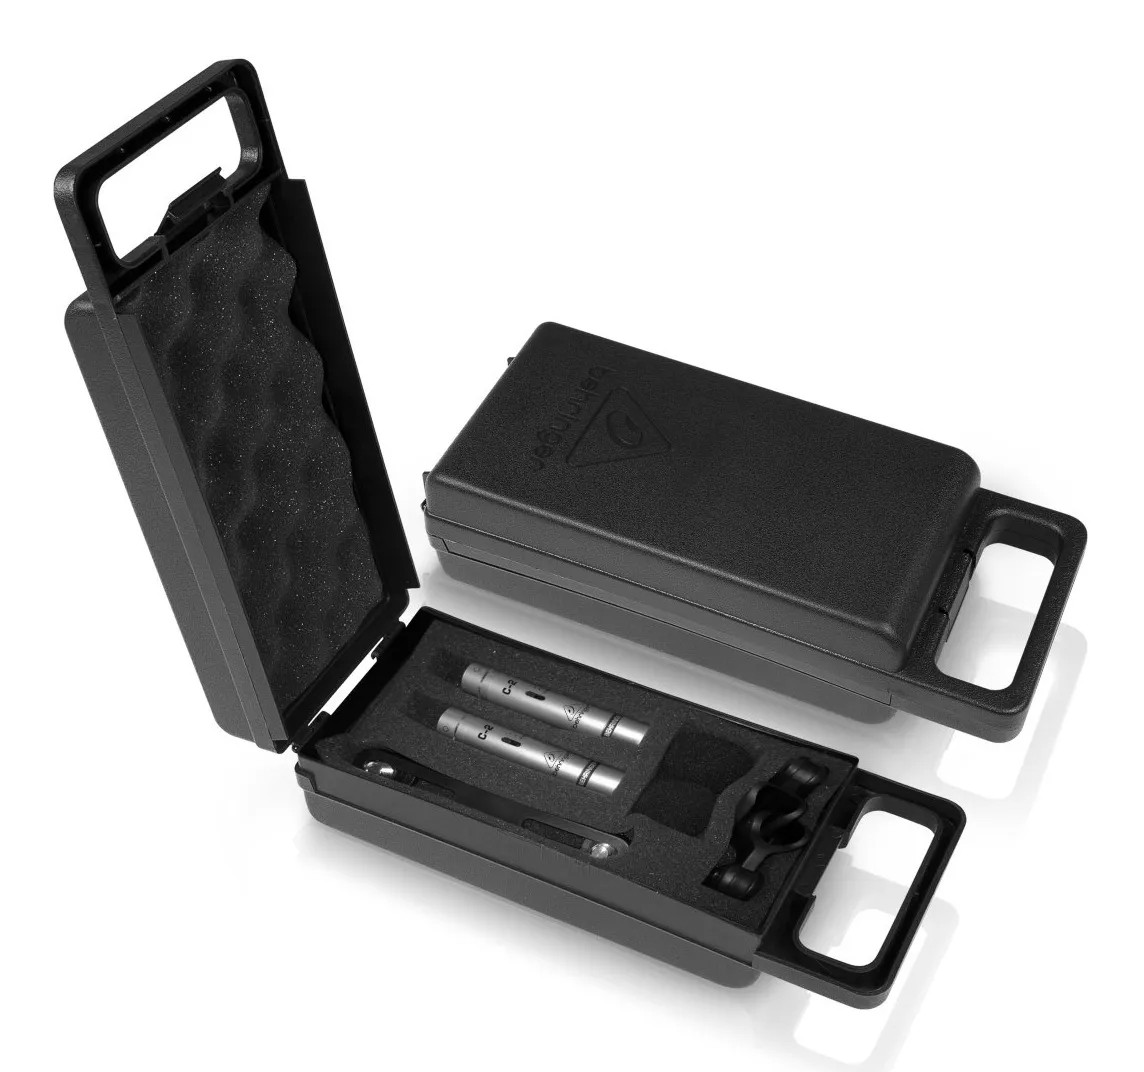 Microfone Behringer Condensador Para Estúdio C2 (par)  - MegaLojaSP